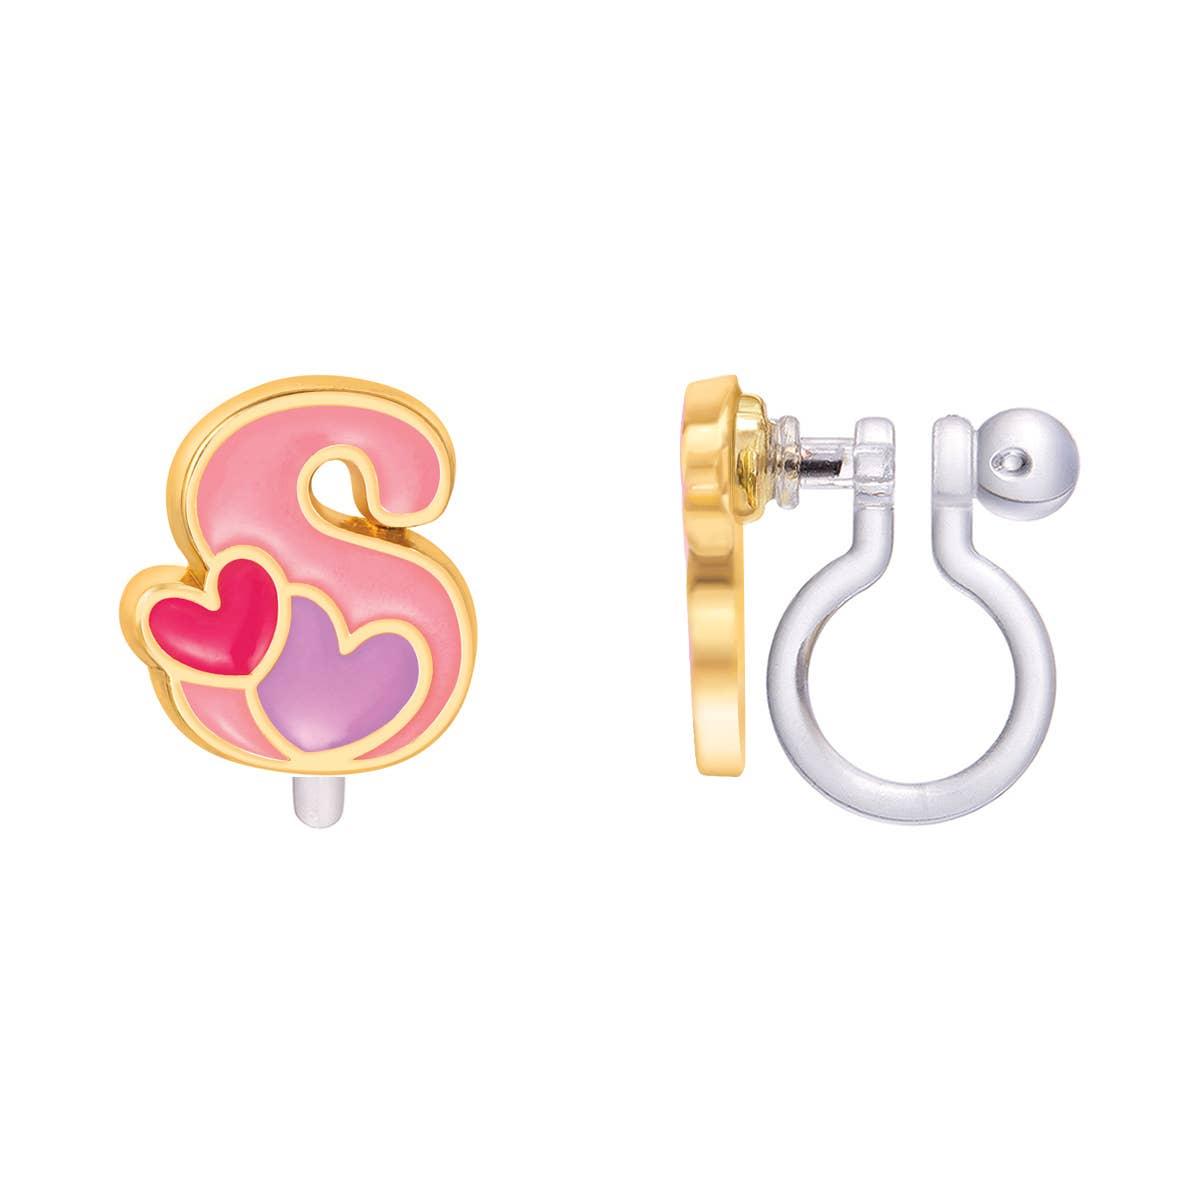 CLIP ON Cutie Initial Earrings- S | Trada Marketplace